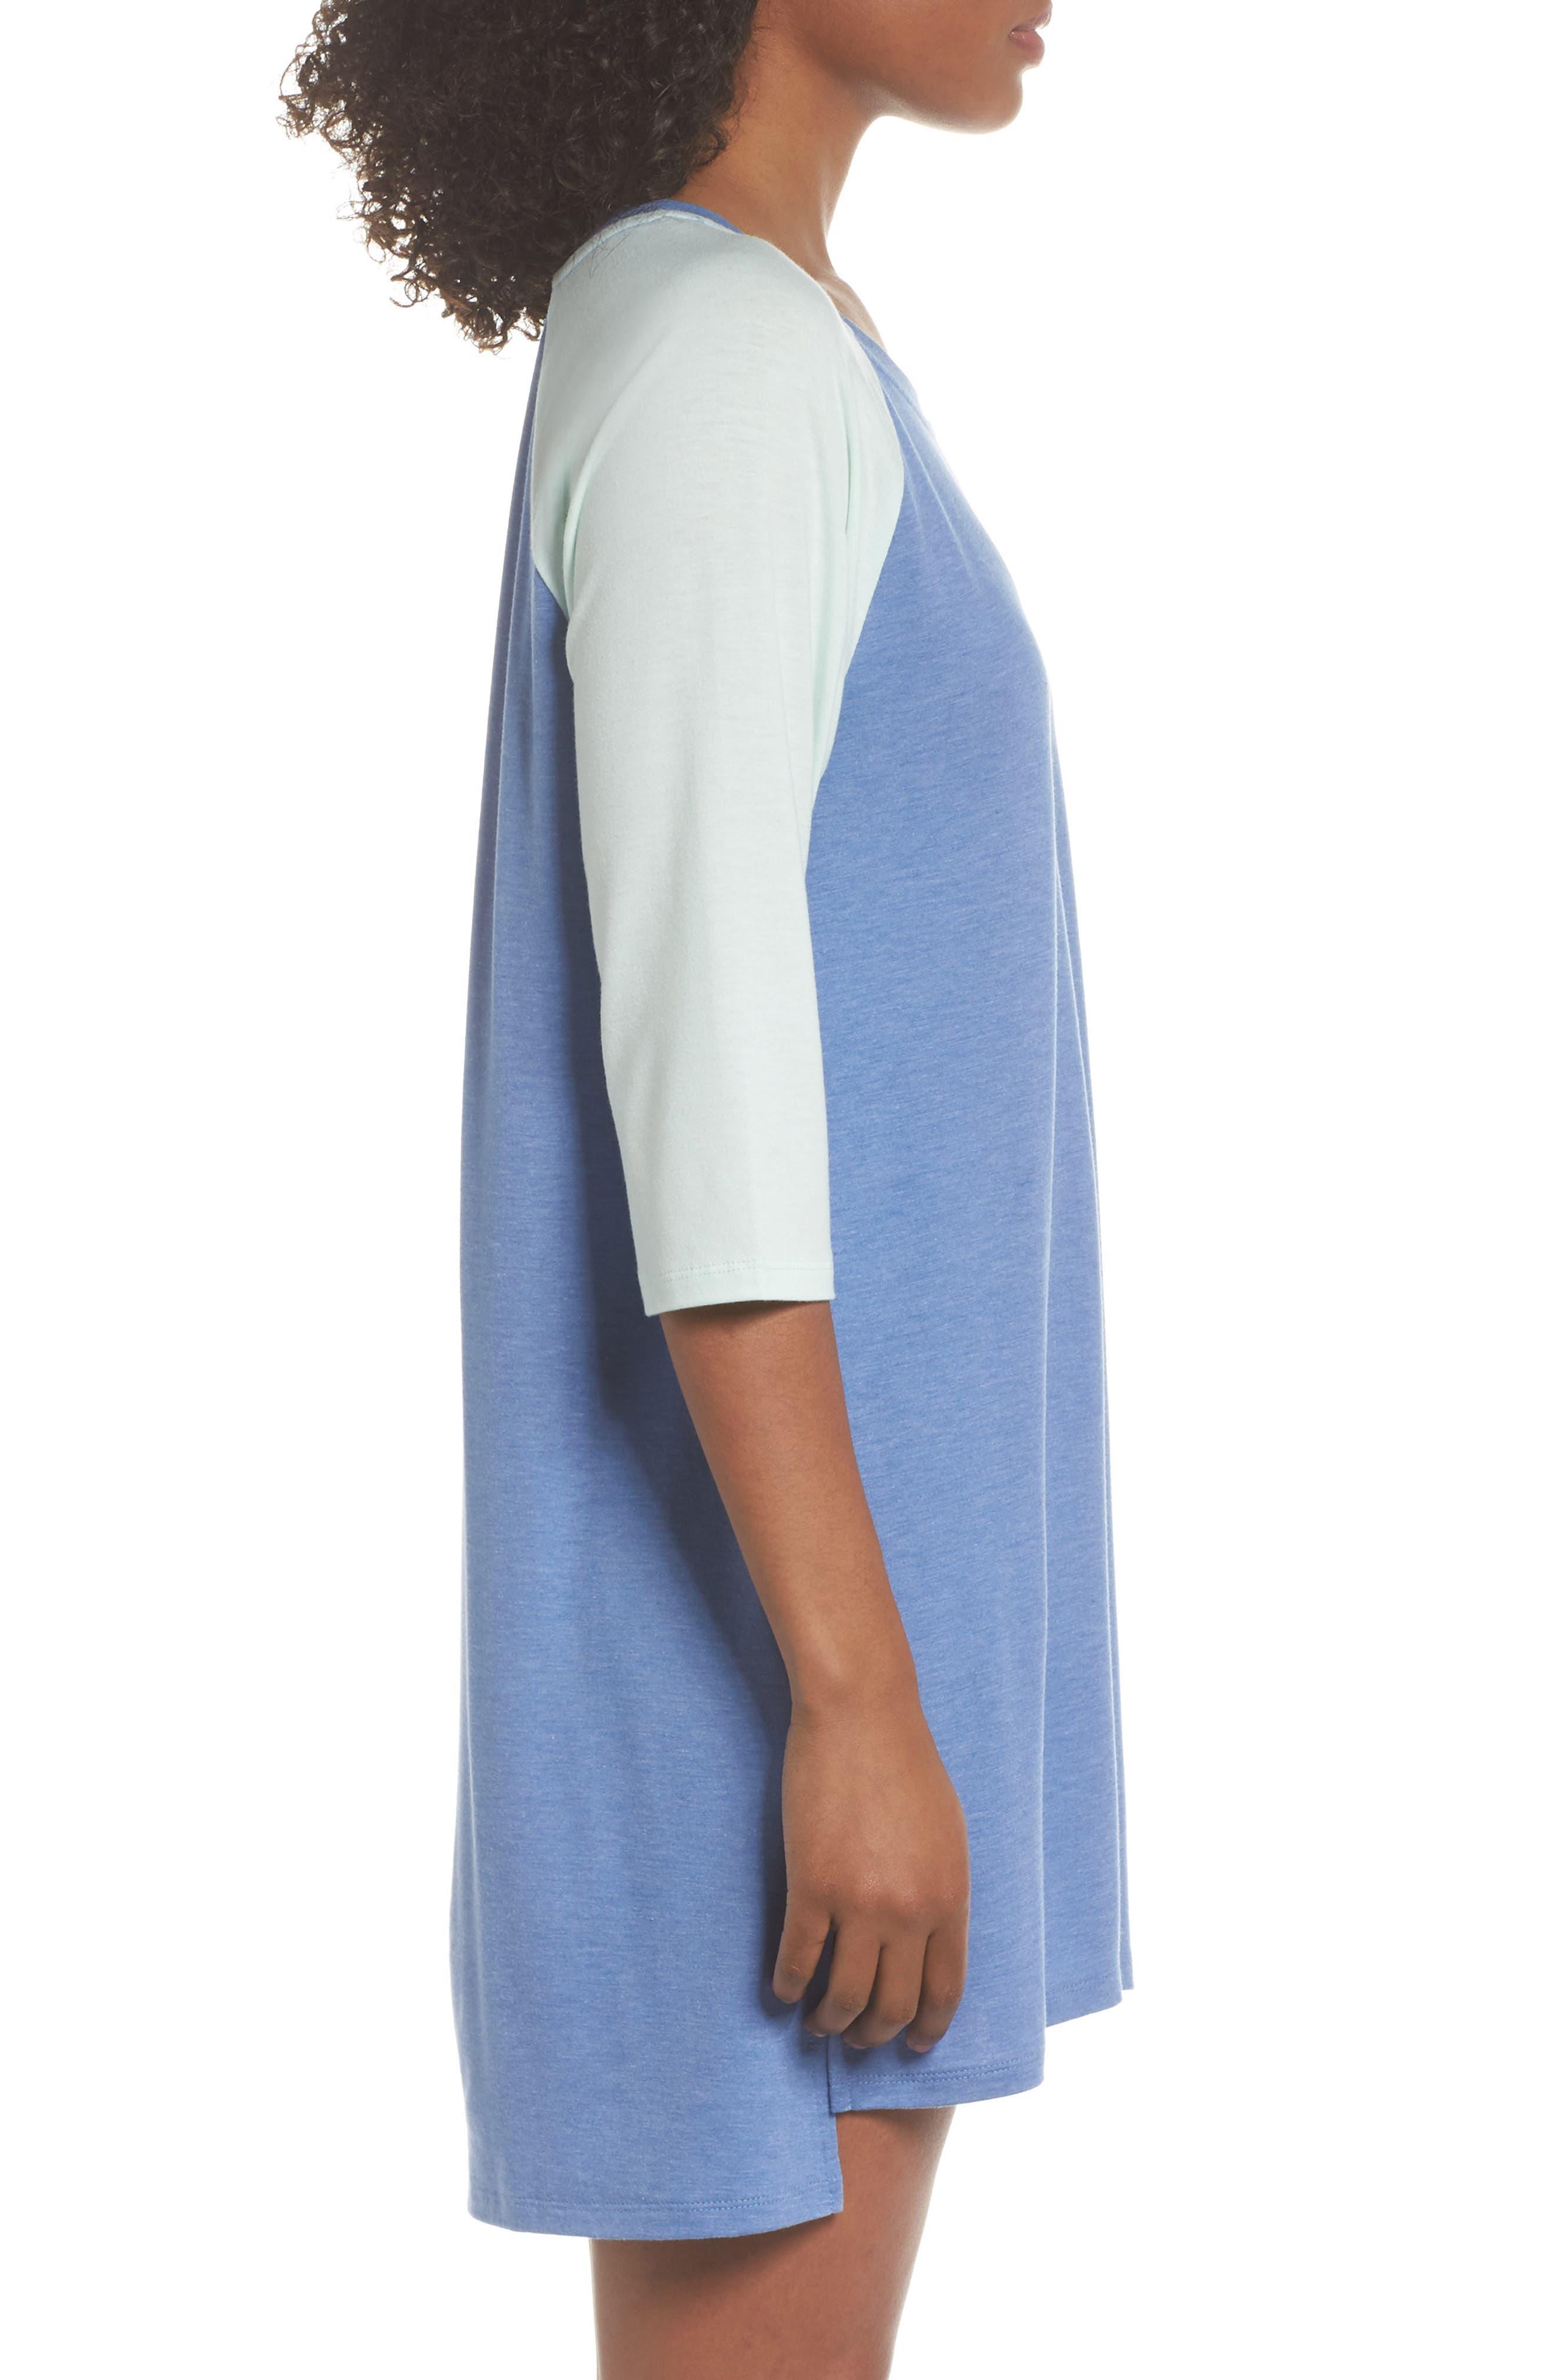 Alternate Image 3  - Honeydew All American Sleep Shirt (2 for $60)